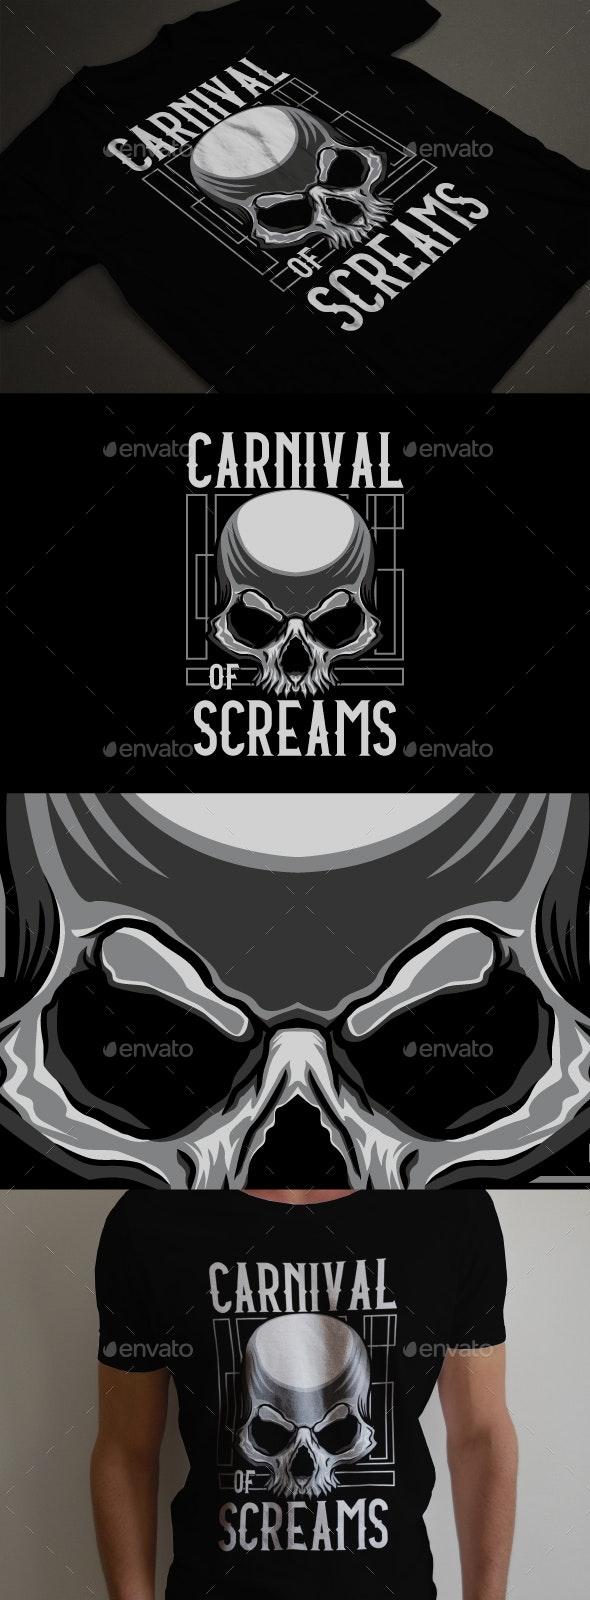 Skull carnival of scream t-shirt design template - T-Shirts